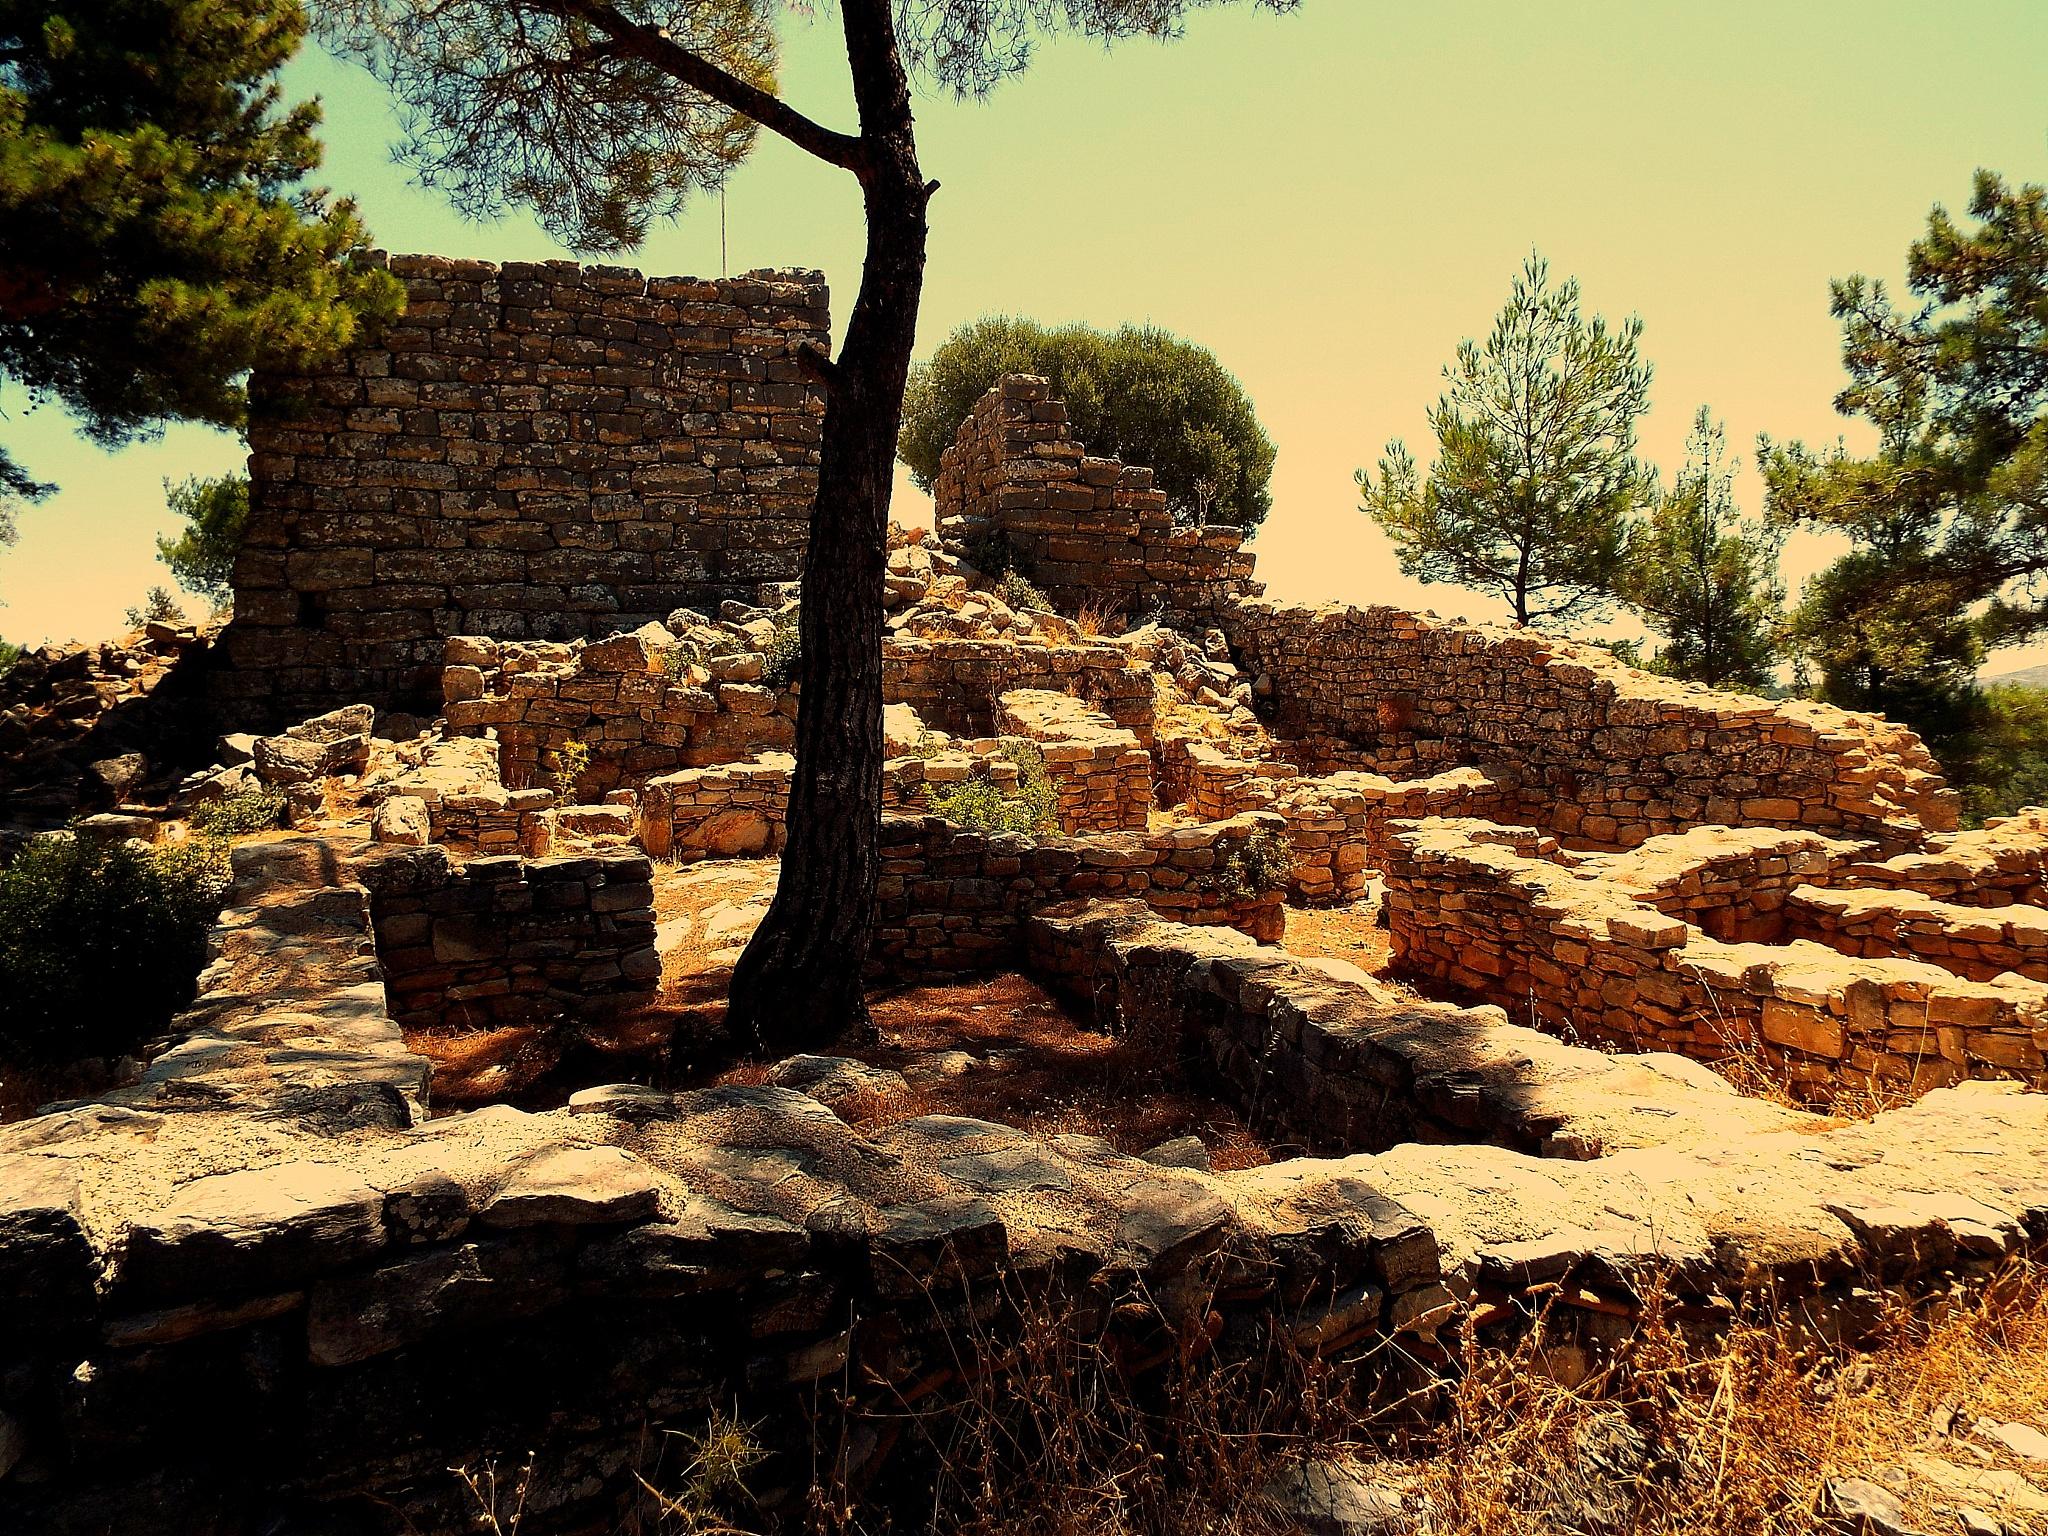 PEDASA ANCIENT CITY CITADEL KONACIK, BODRUM by Akin Saner